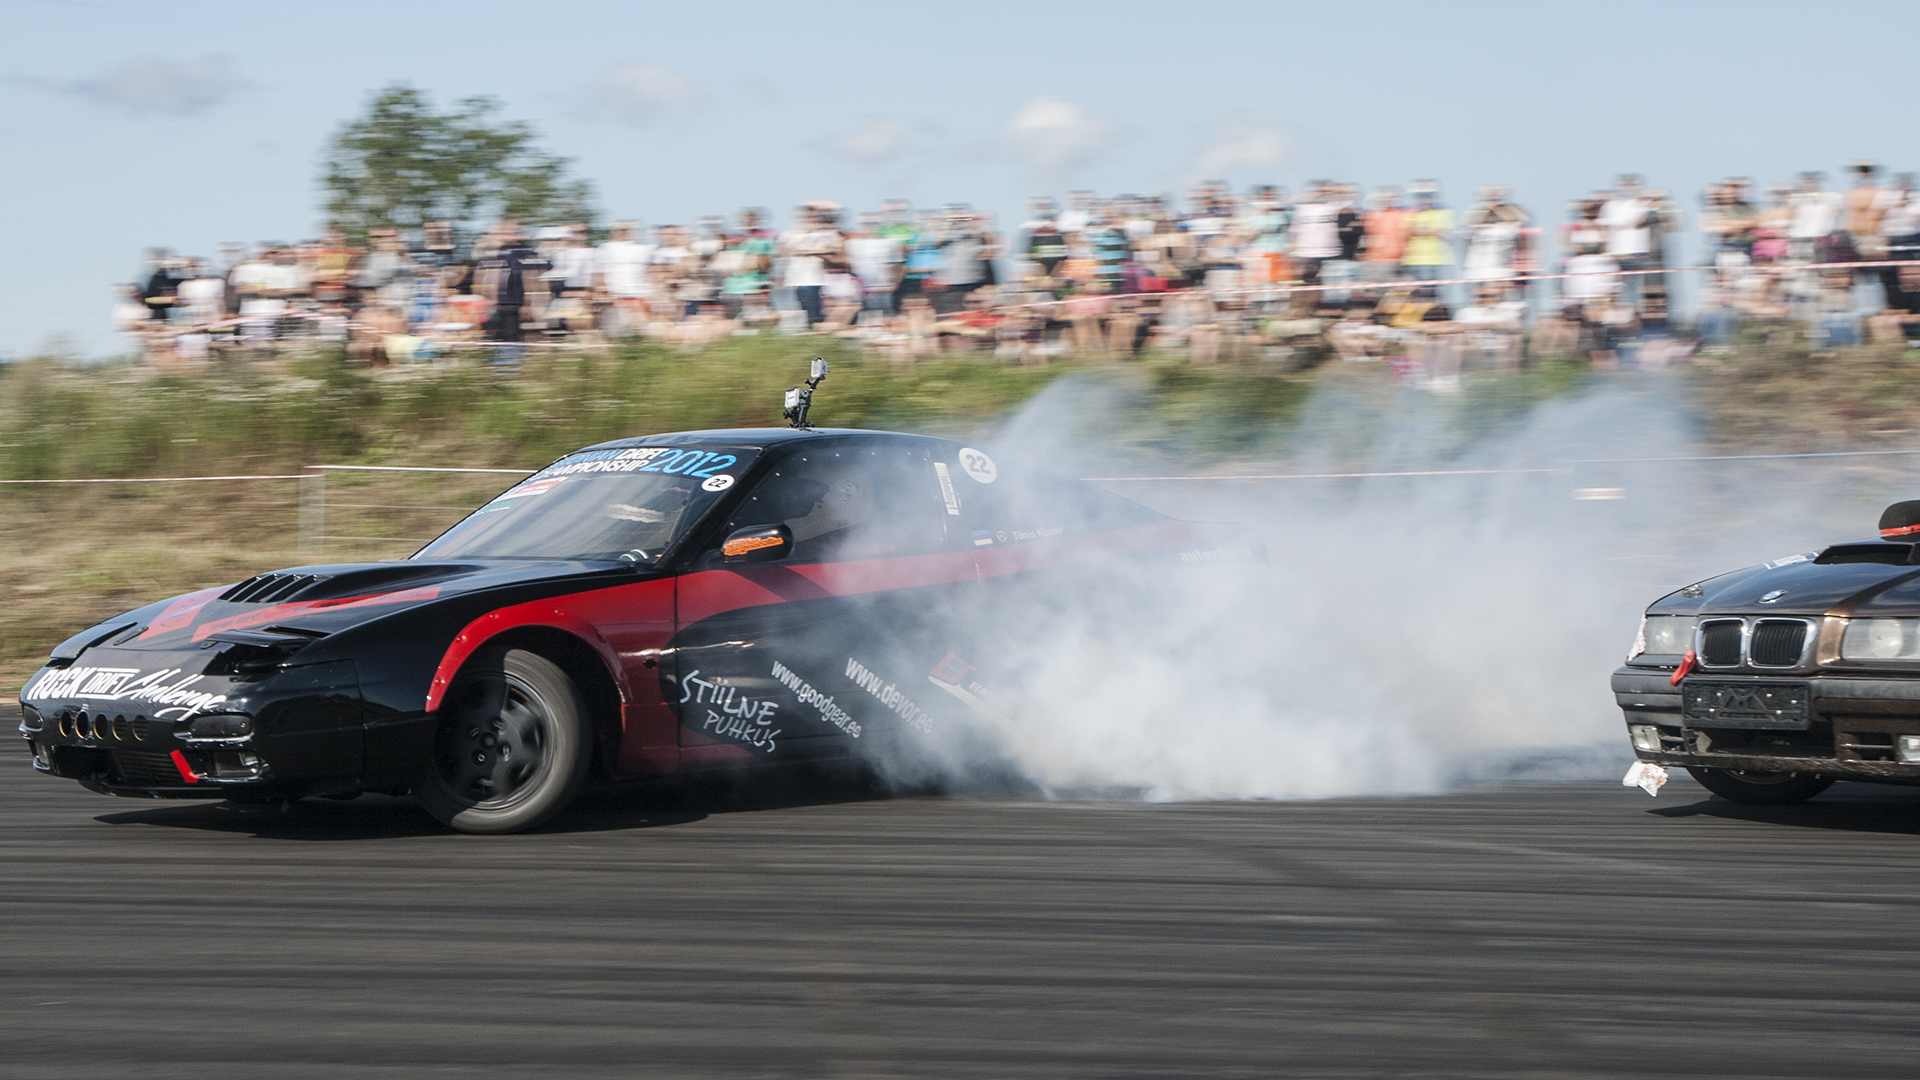 10-years-of-drifting-in-estonia-2012-by-wheelsbywovka-4